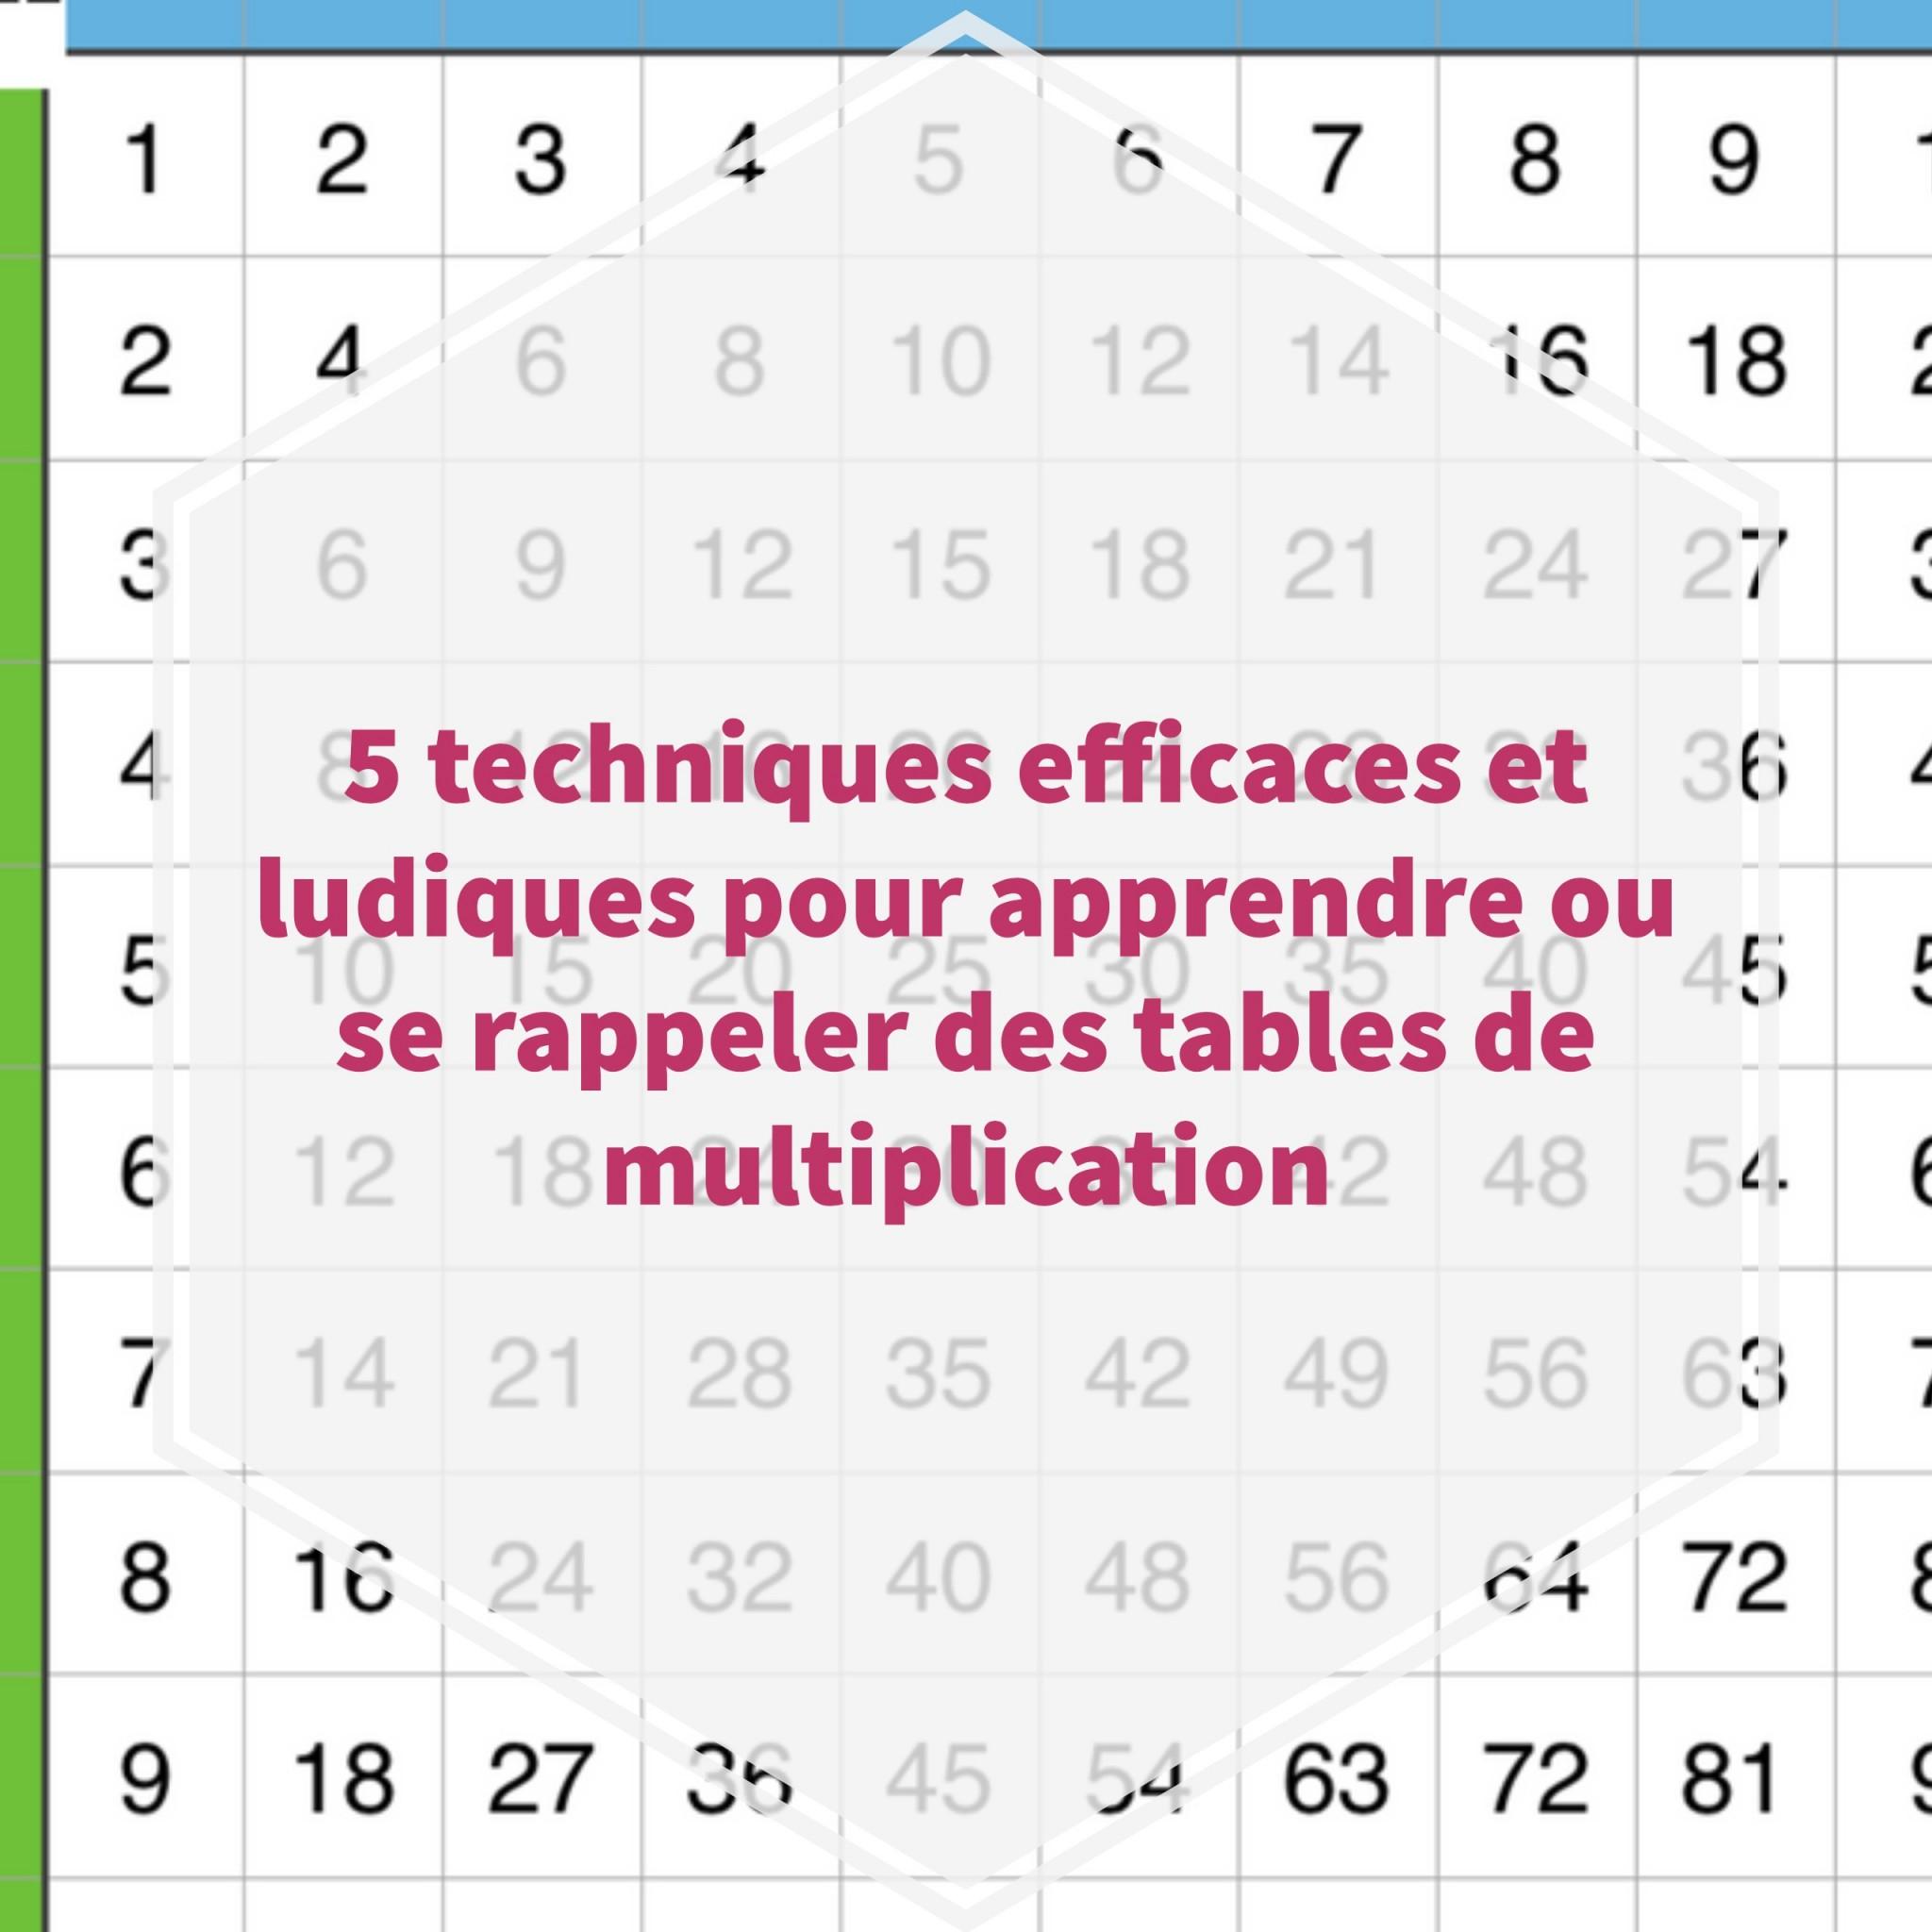 se rappeler des tables de multiplication